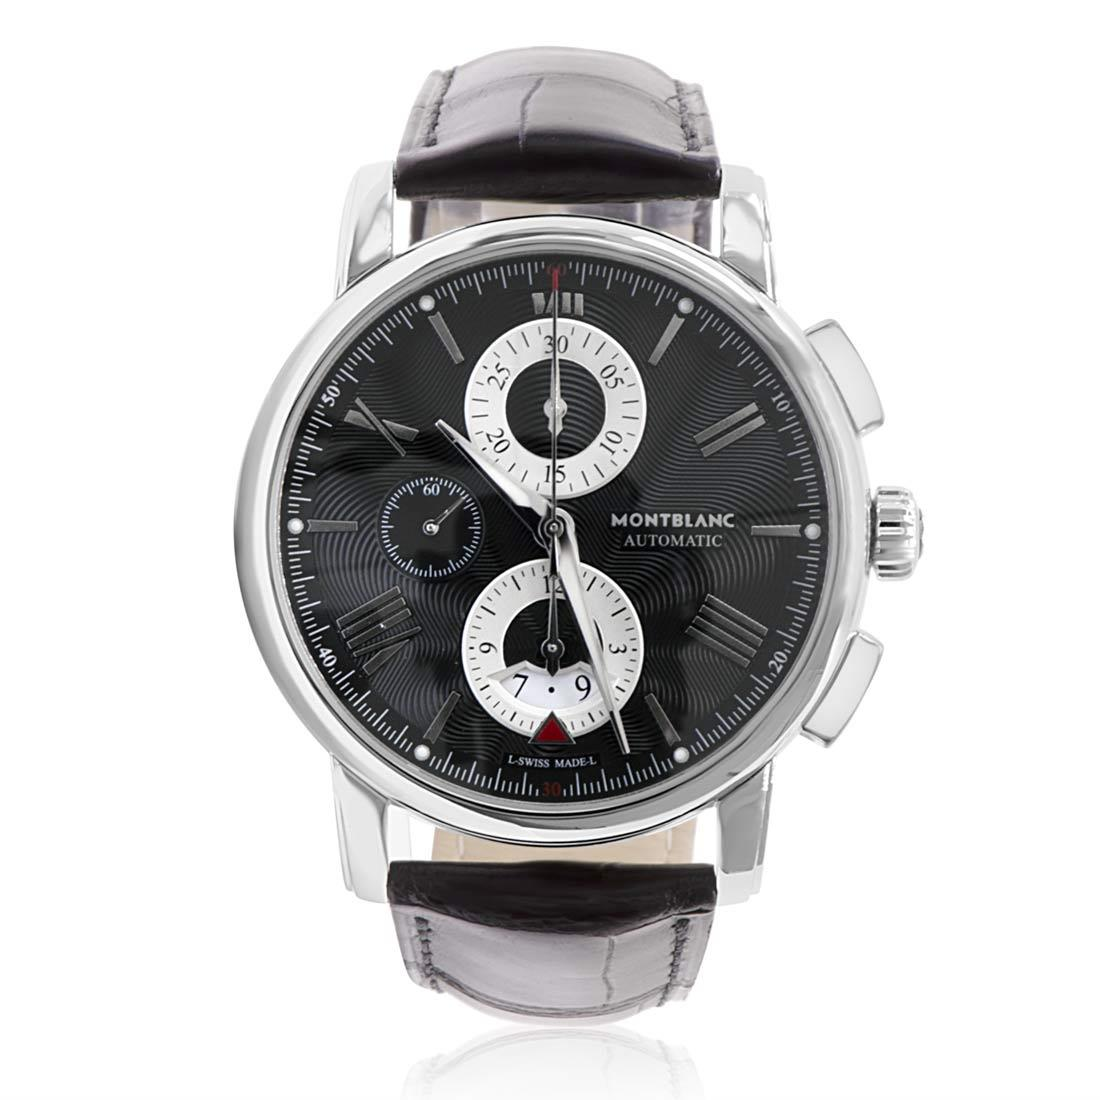 Orologio Montblanc 4810 Chronograph Automatic - MONTBLANC